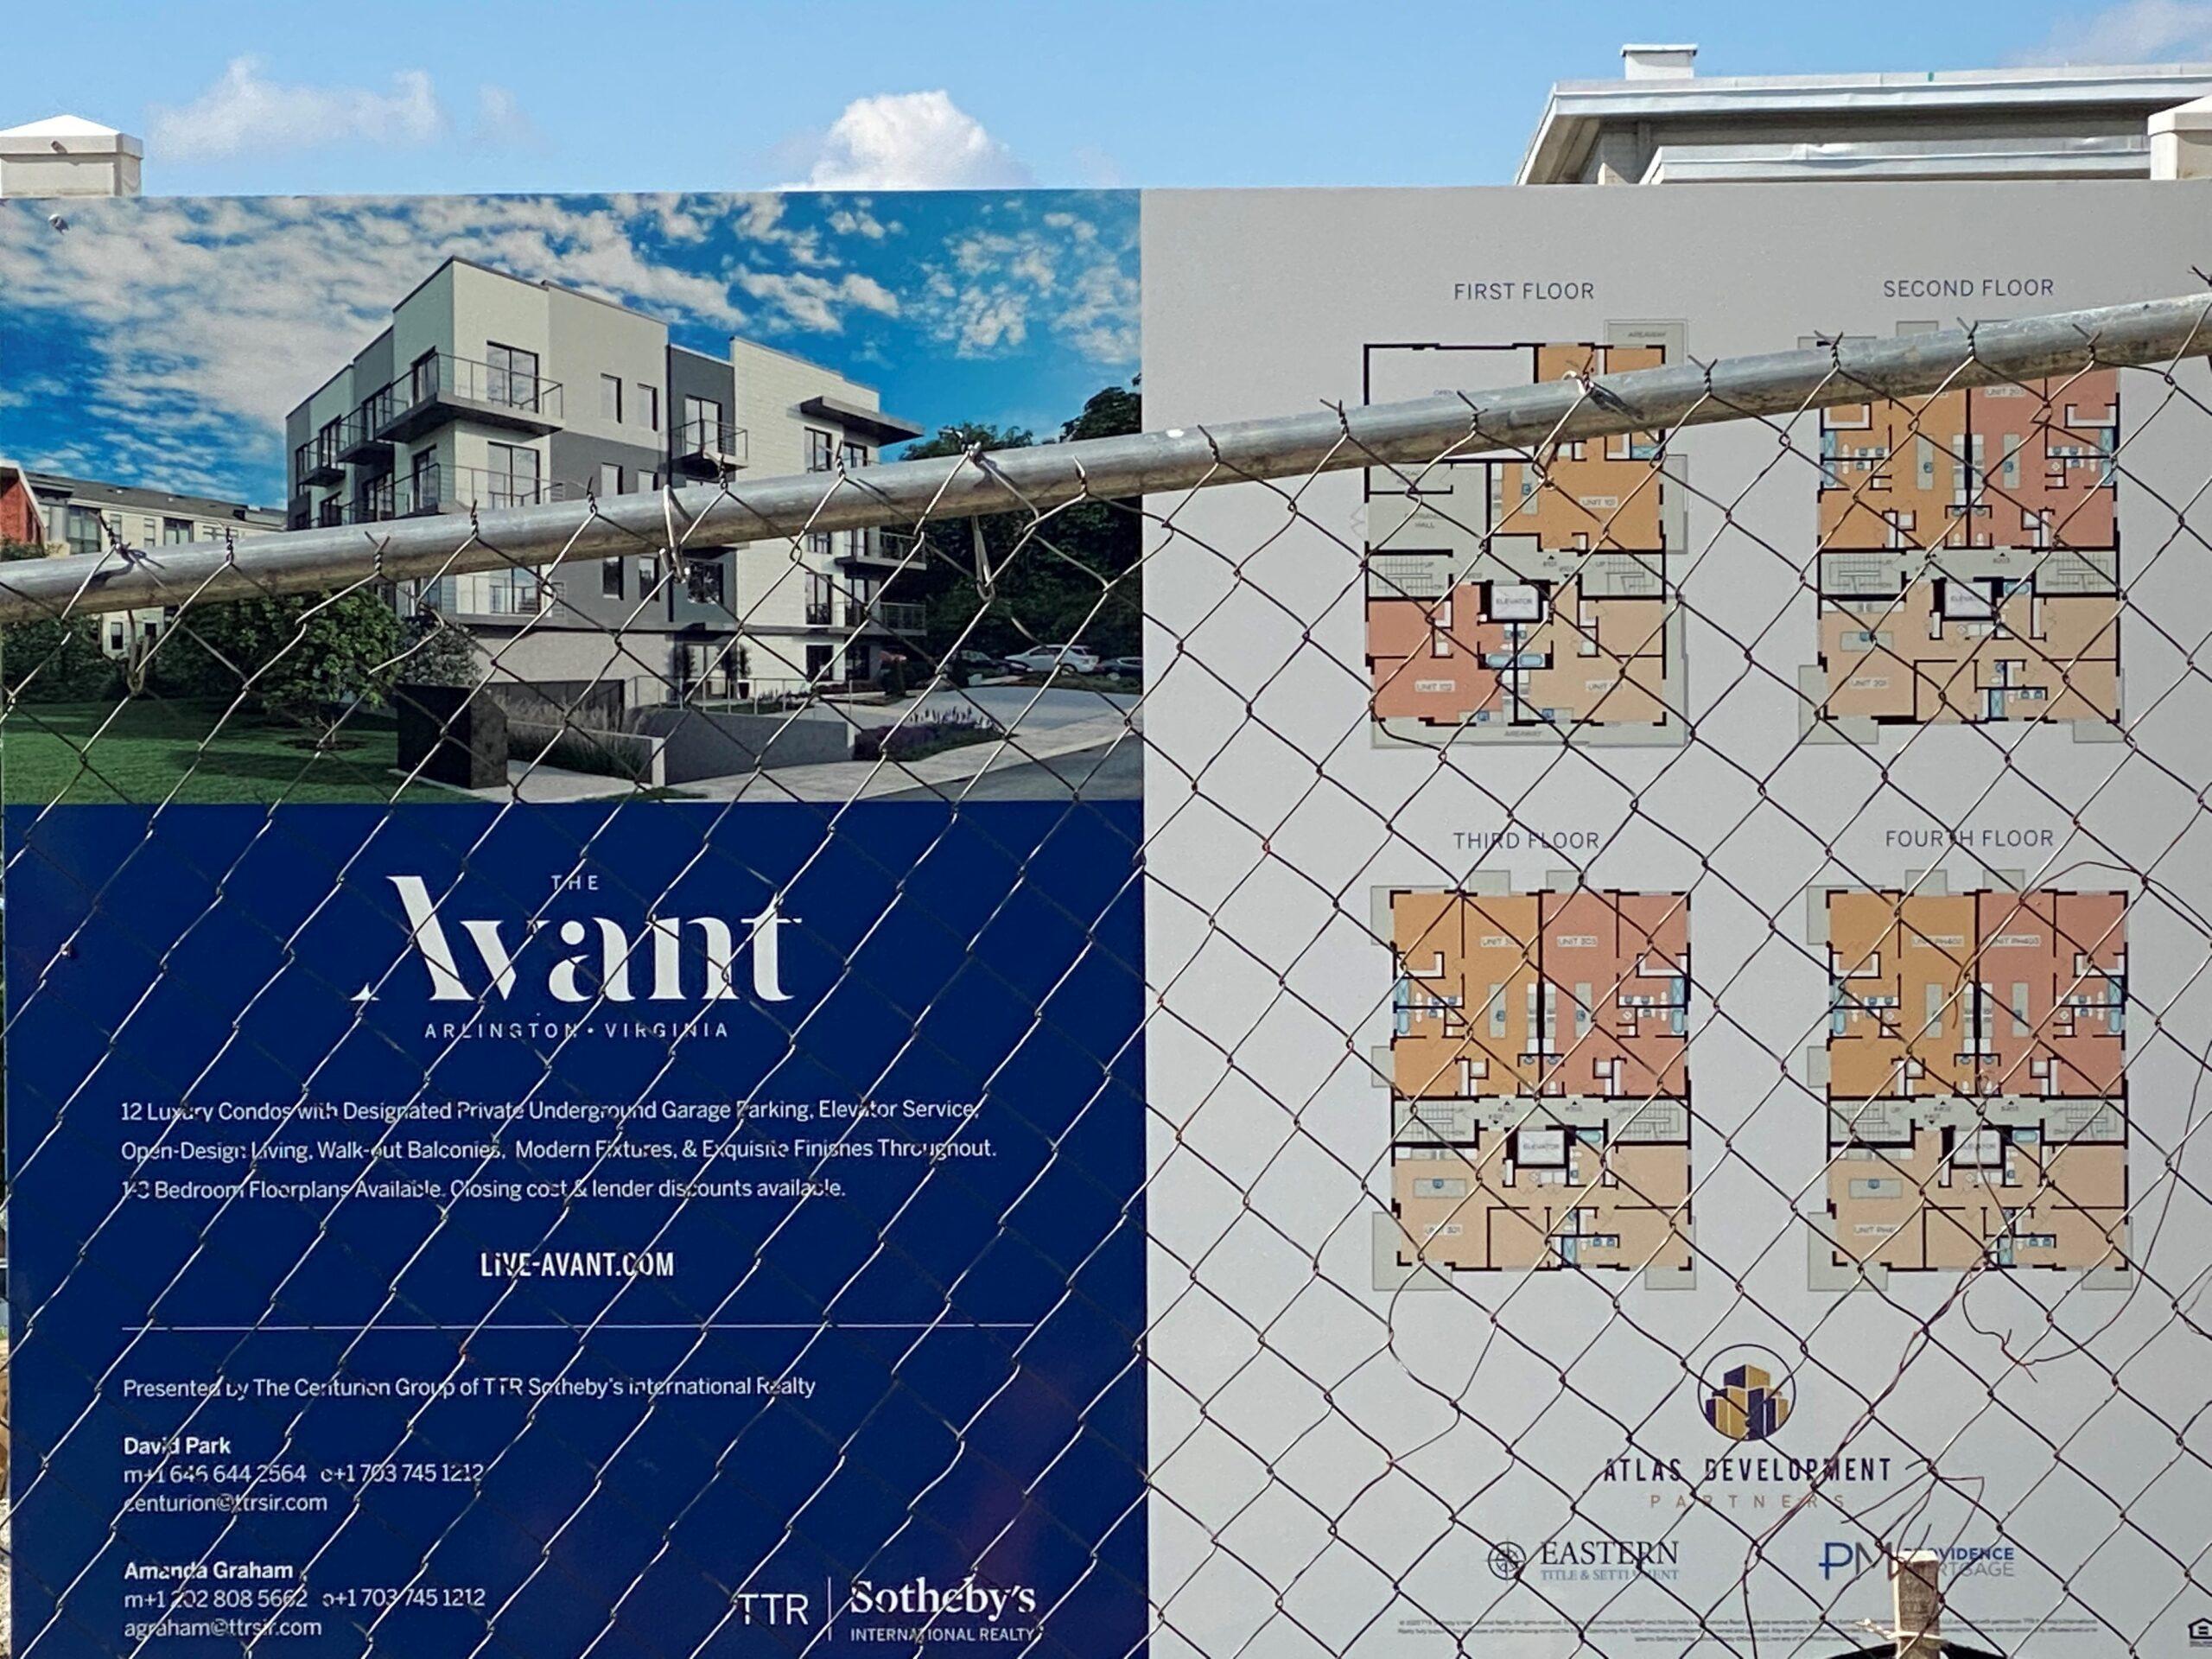 The Avant floor plans